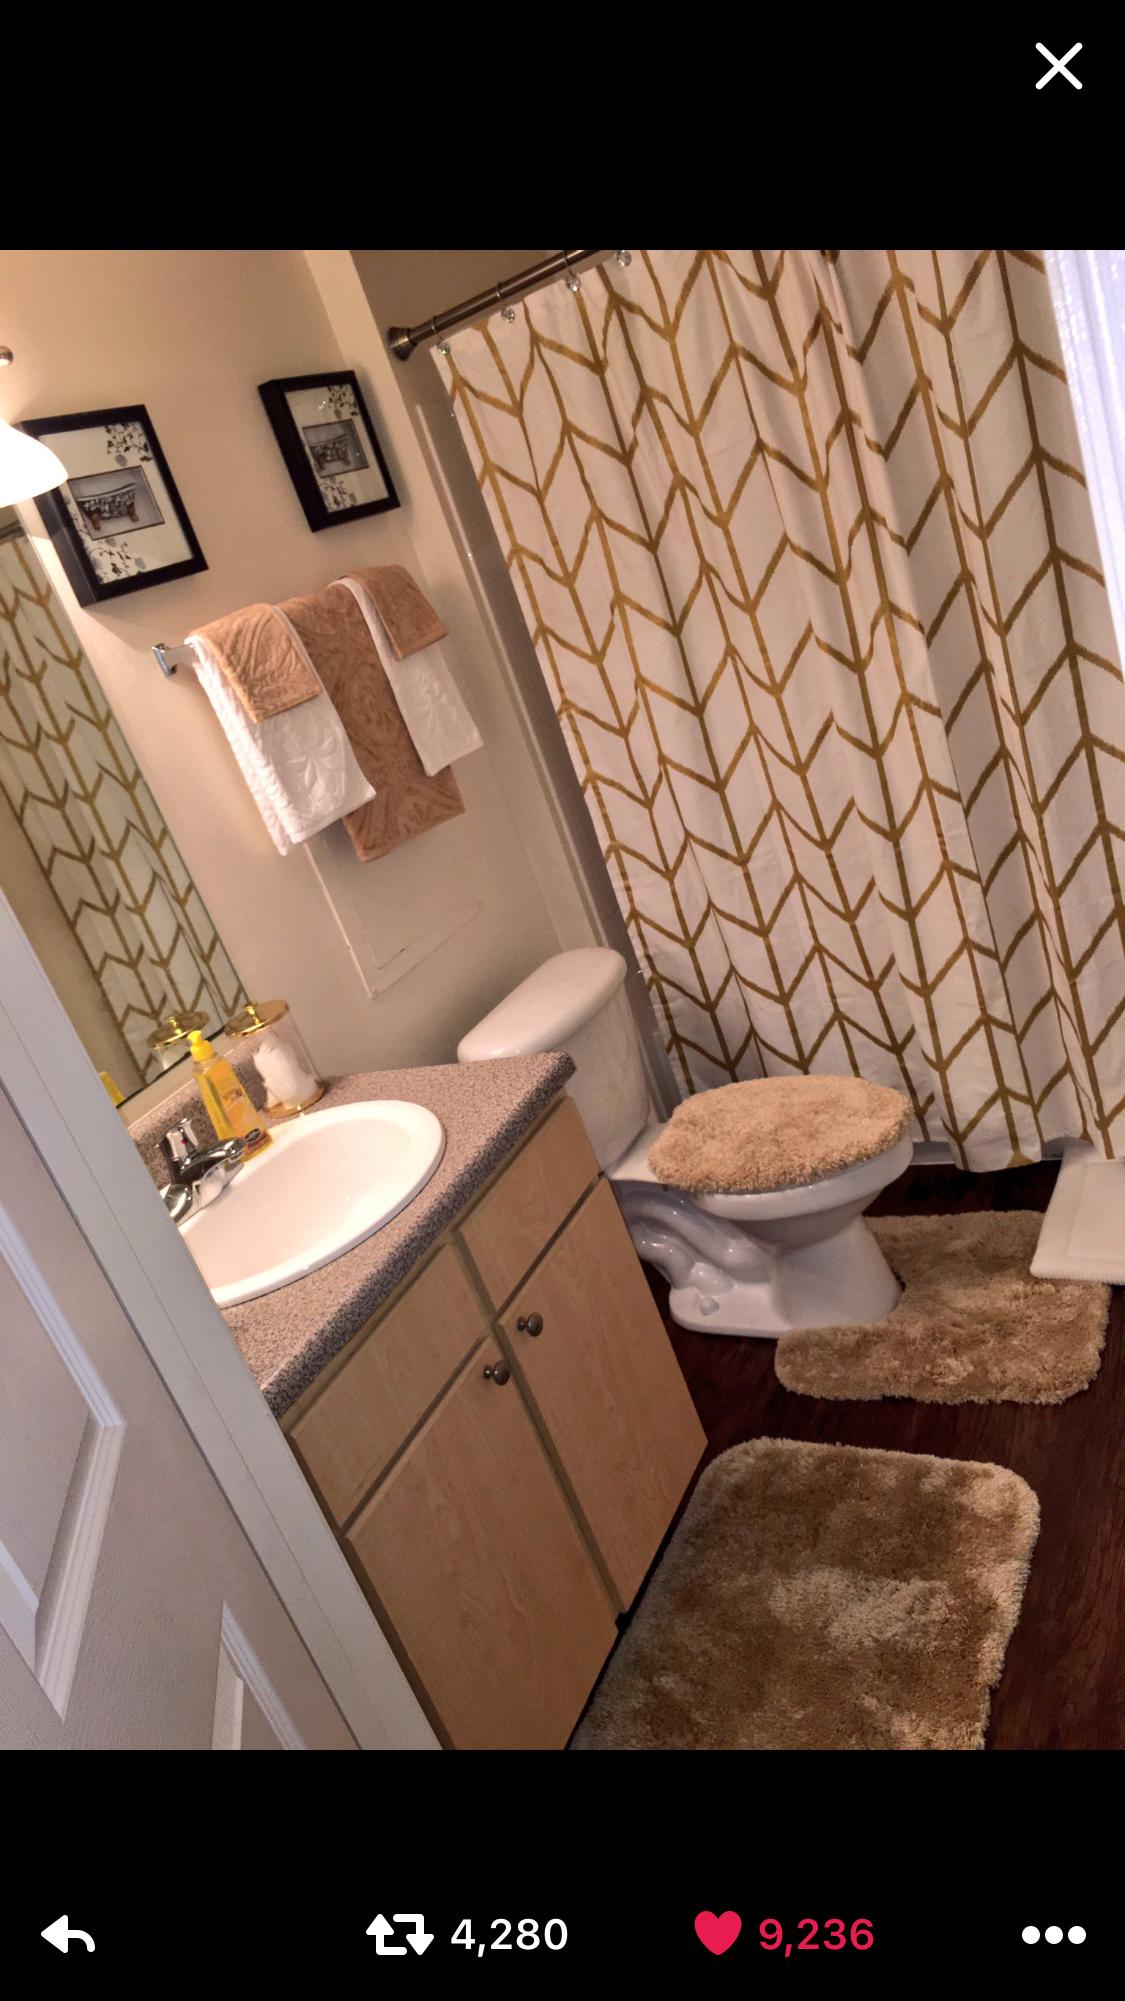 Snapchat Ogg Madieee Pinterest Goldeinee Bathroom Decor Apartment Bathroom Decor Themes Restroom Decor